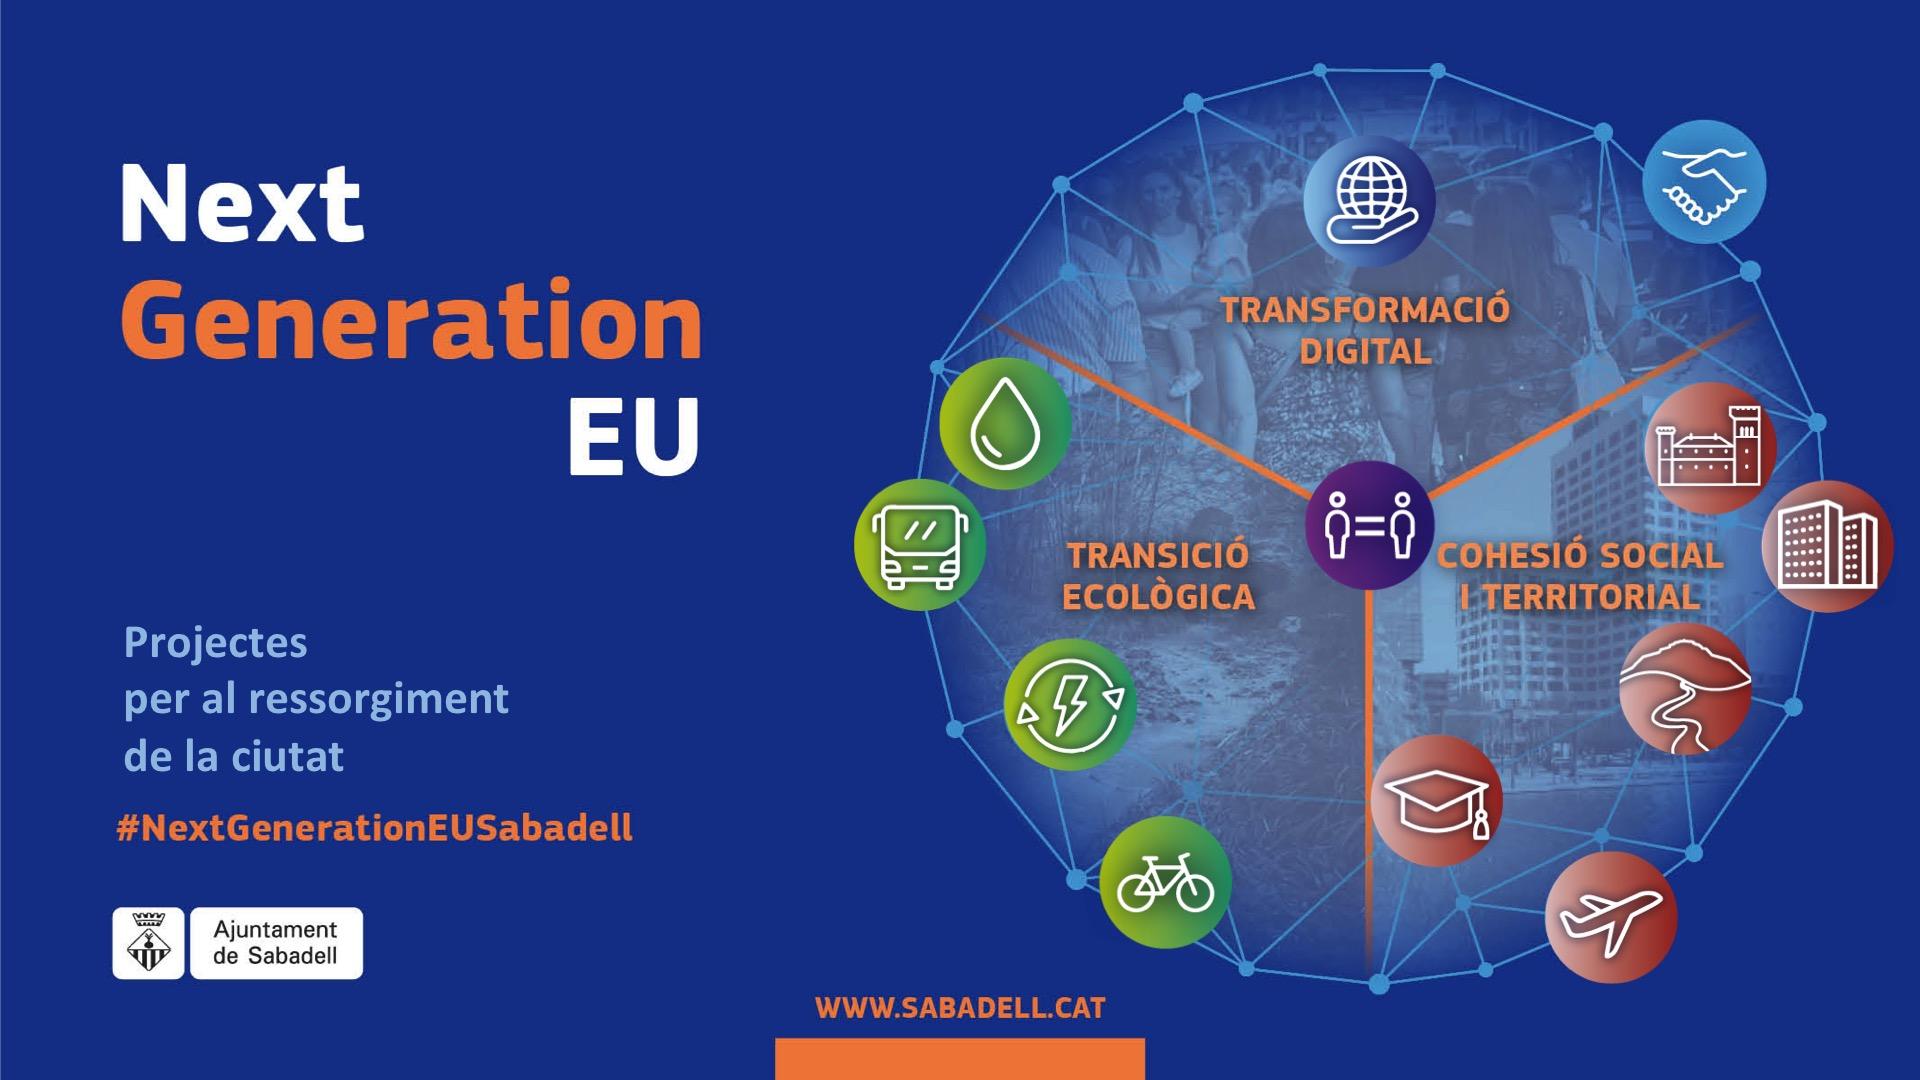 Next Generation EU Sabadell